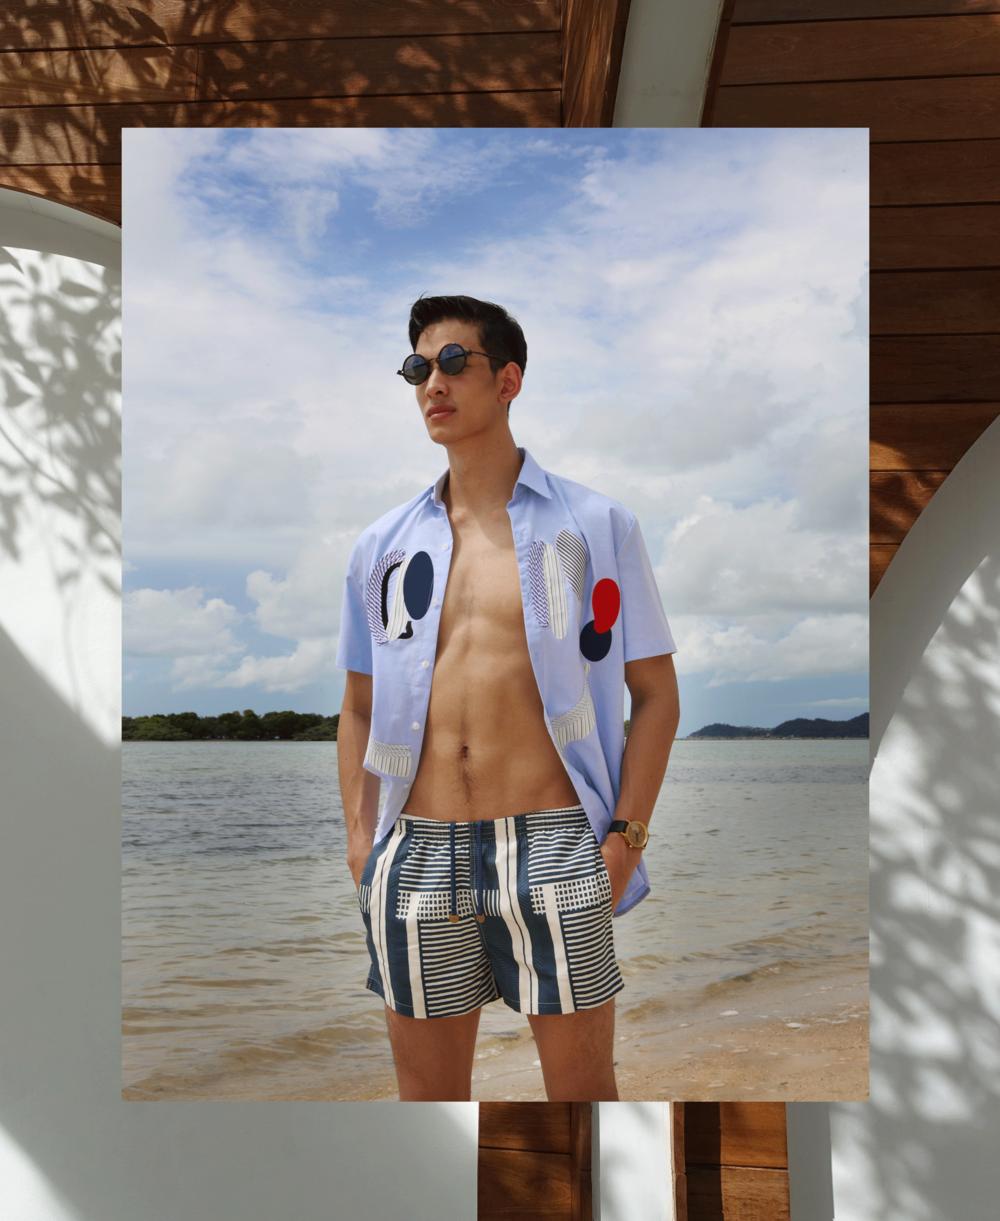 shirt : Everyday Kmkm / trunks : TIMO / watch : FORREST / sunglasses : TAVAT